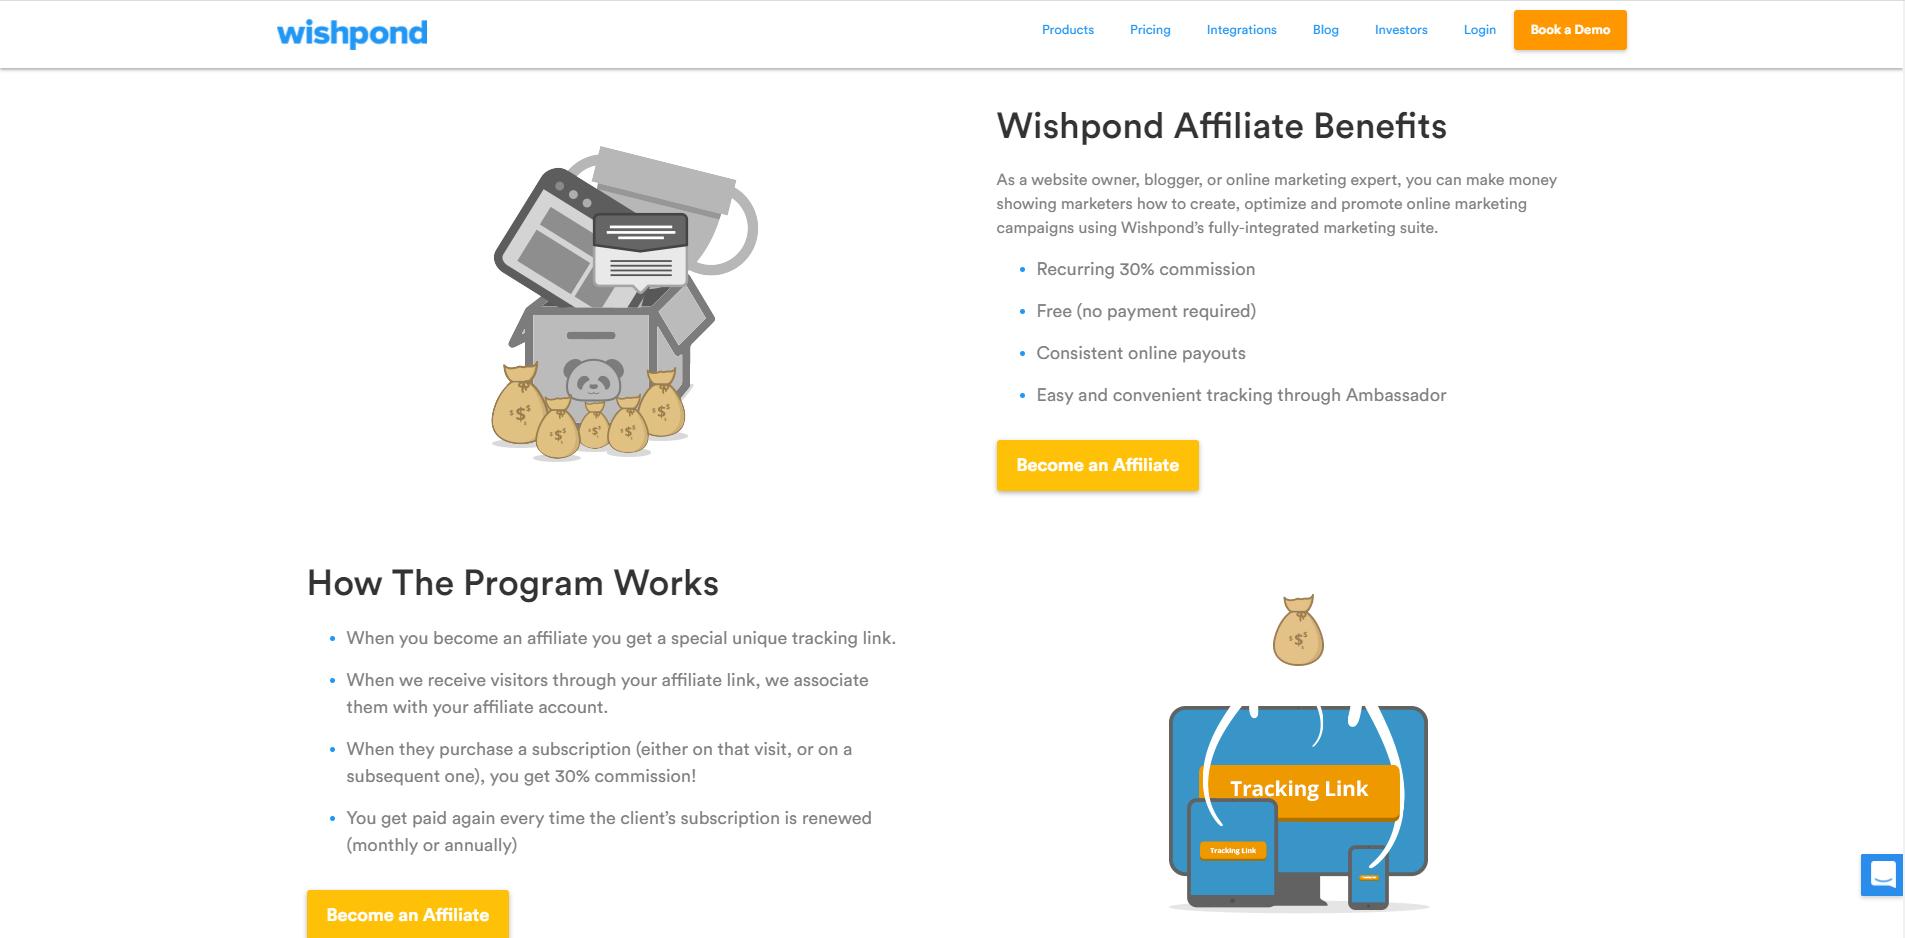 Wishpond affiliate